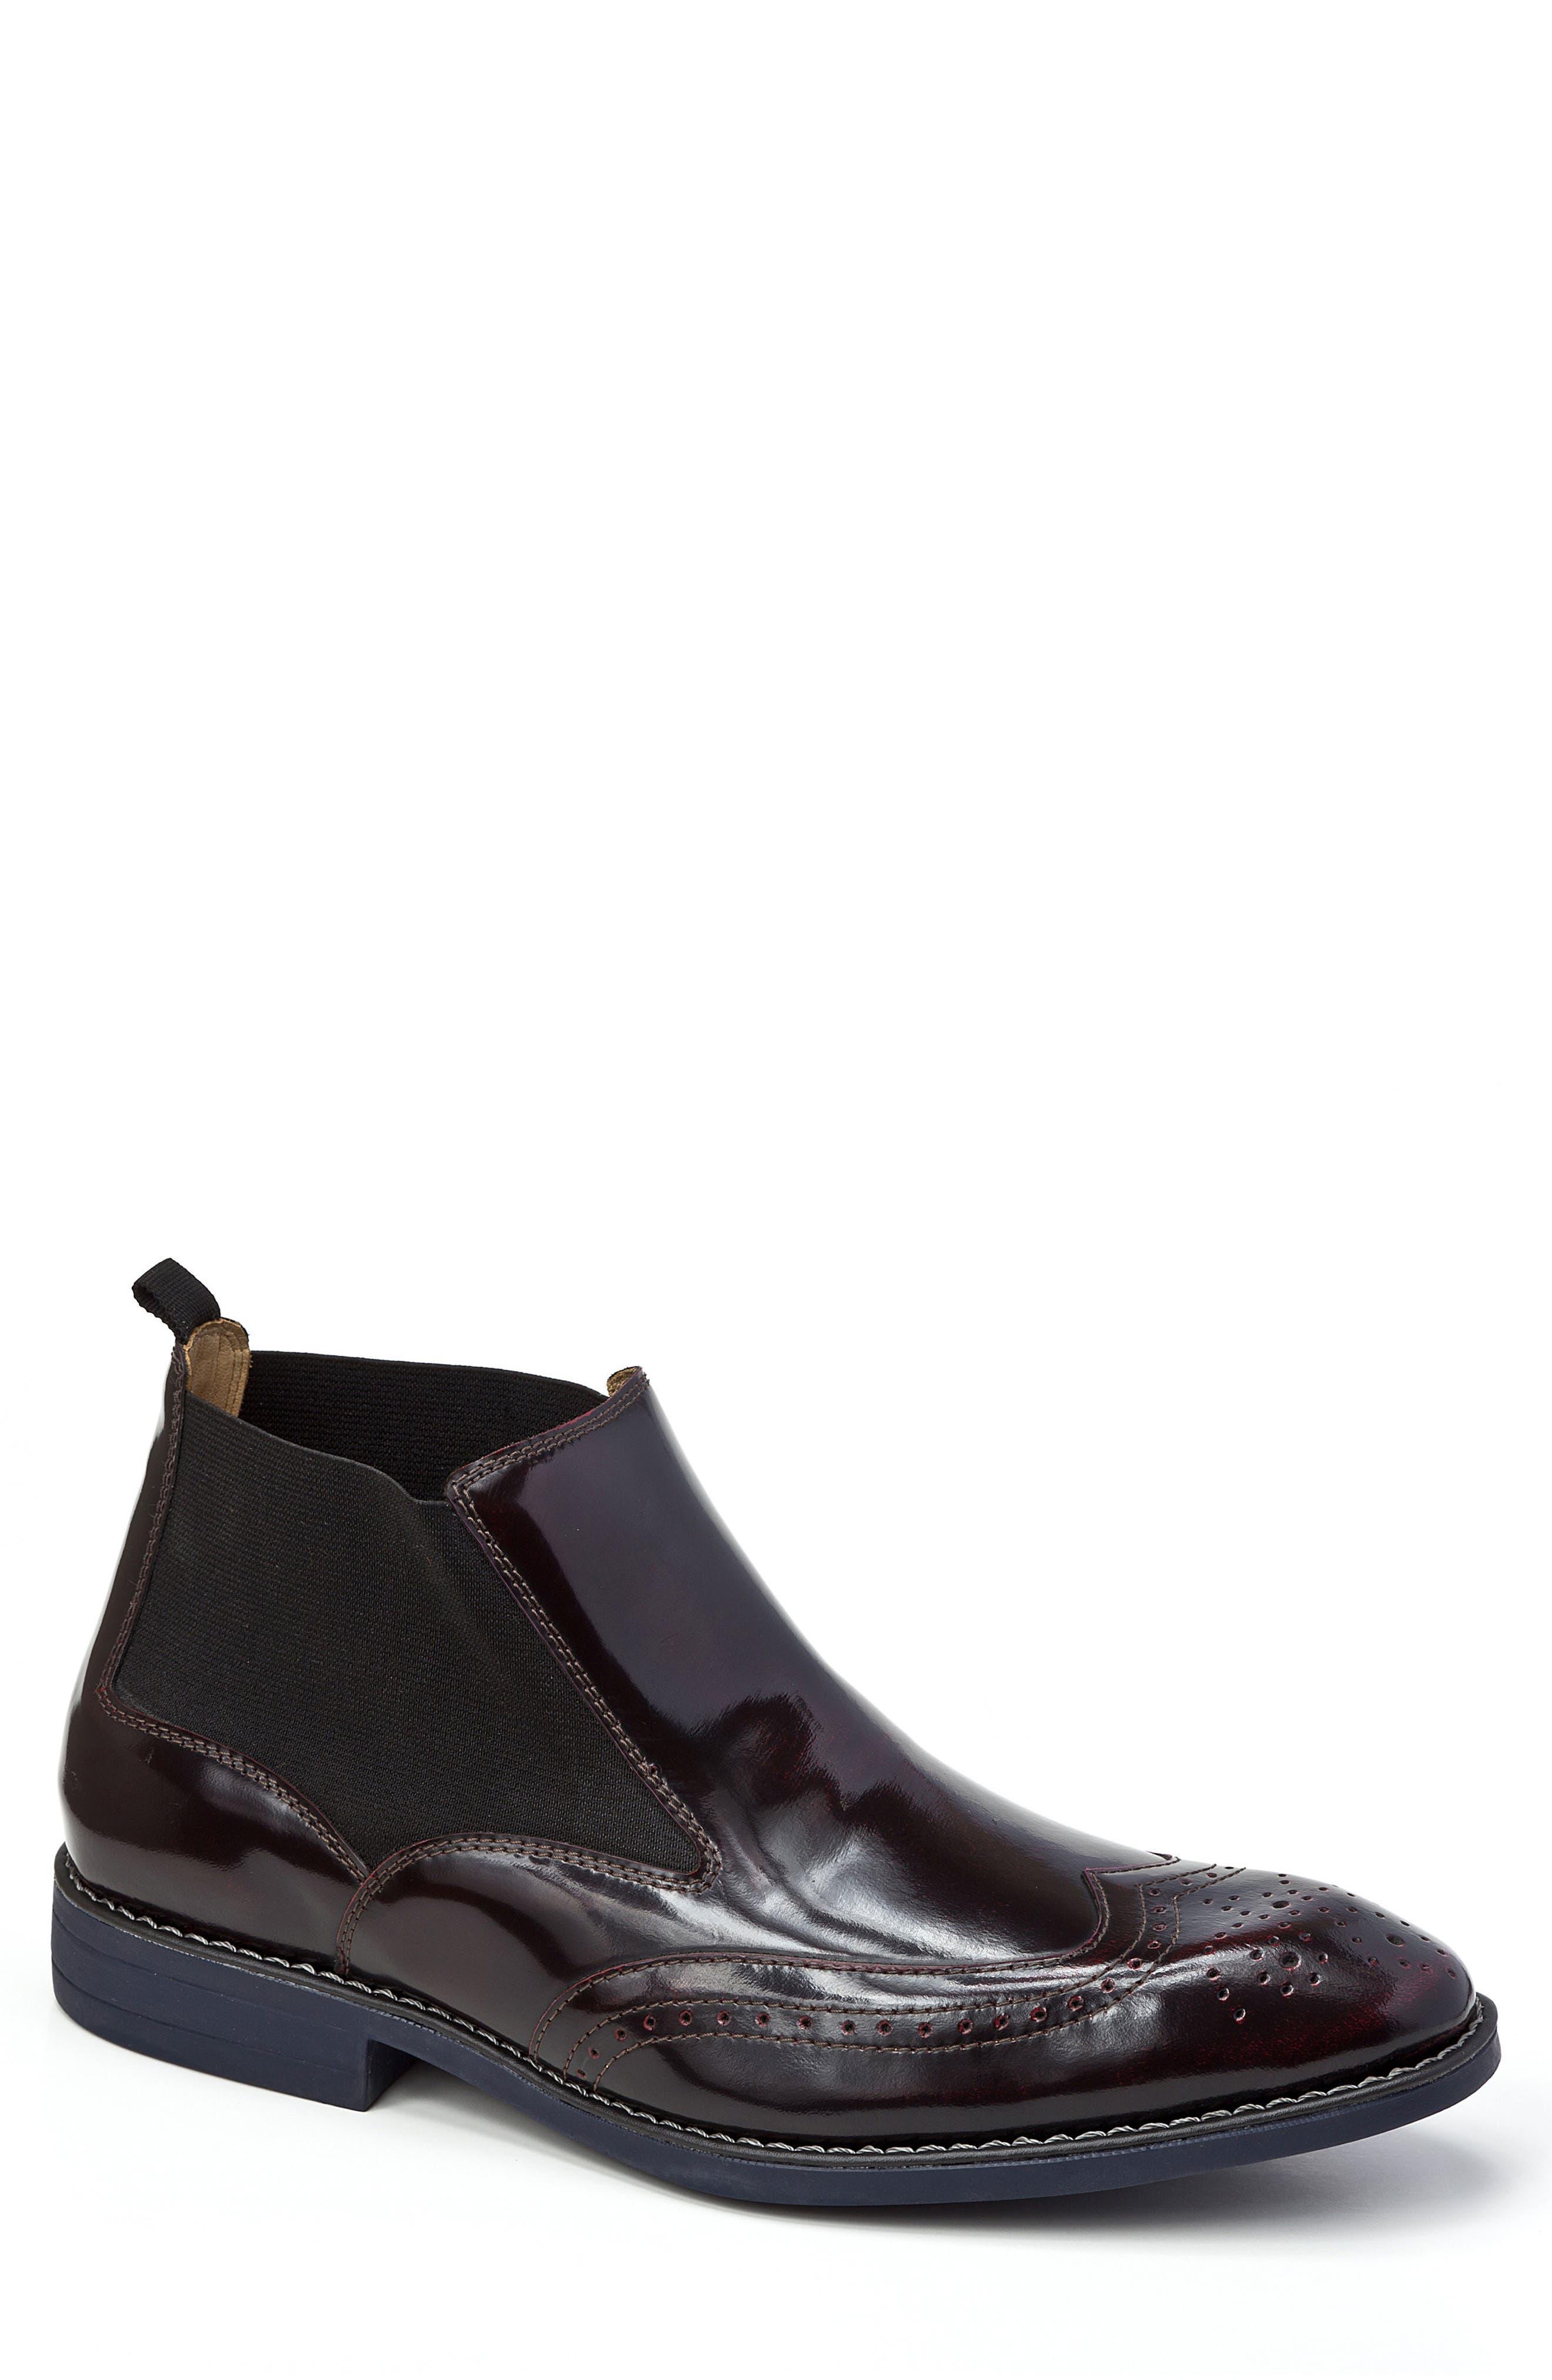 Emanuel Chelsea Boot,                             Main thumbnail 1, color,                             930